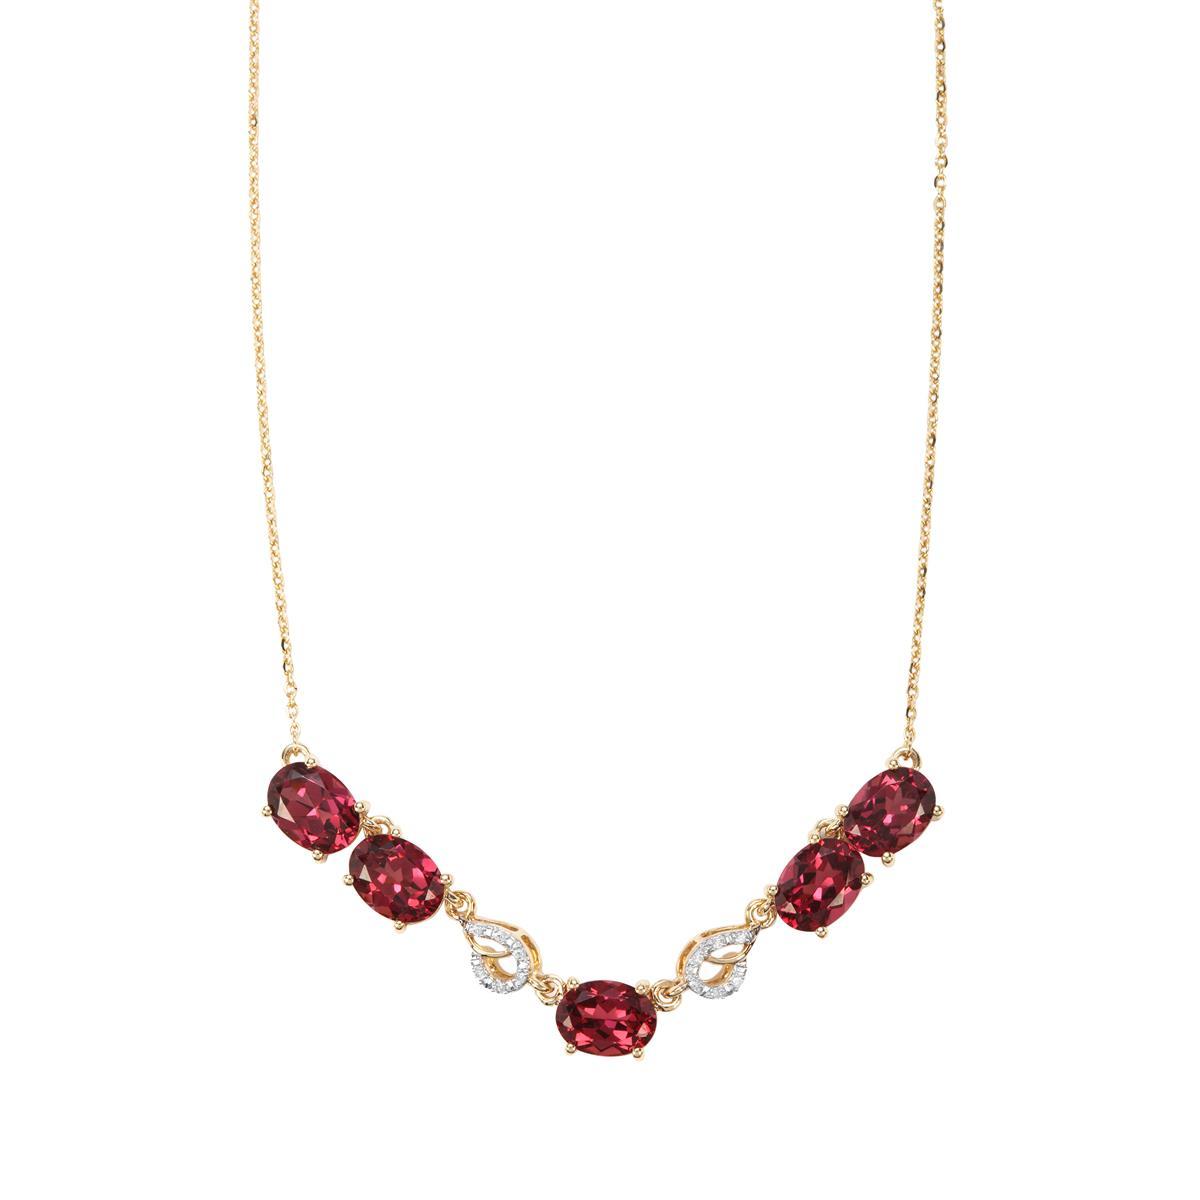 c88e6e885 Mahenge Garnet Necklace with Diamond in 9K Gold 7.95cts   ZYTQ46 ...